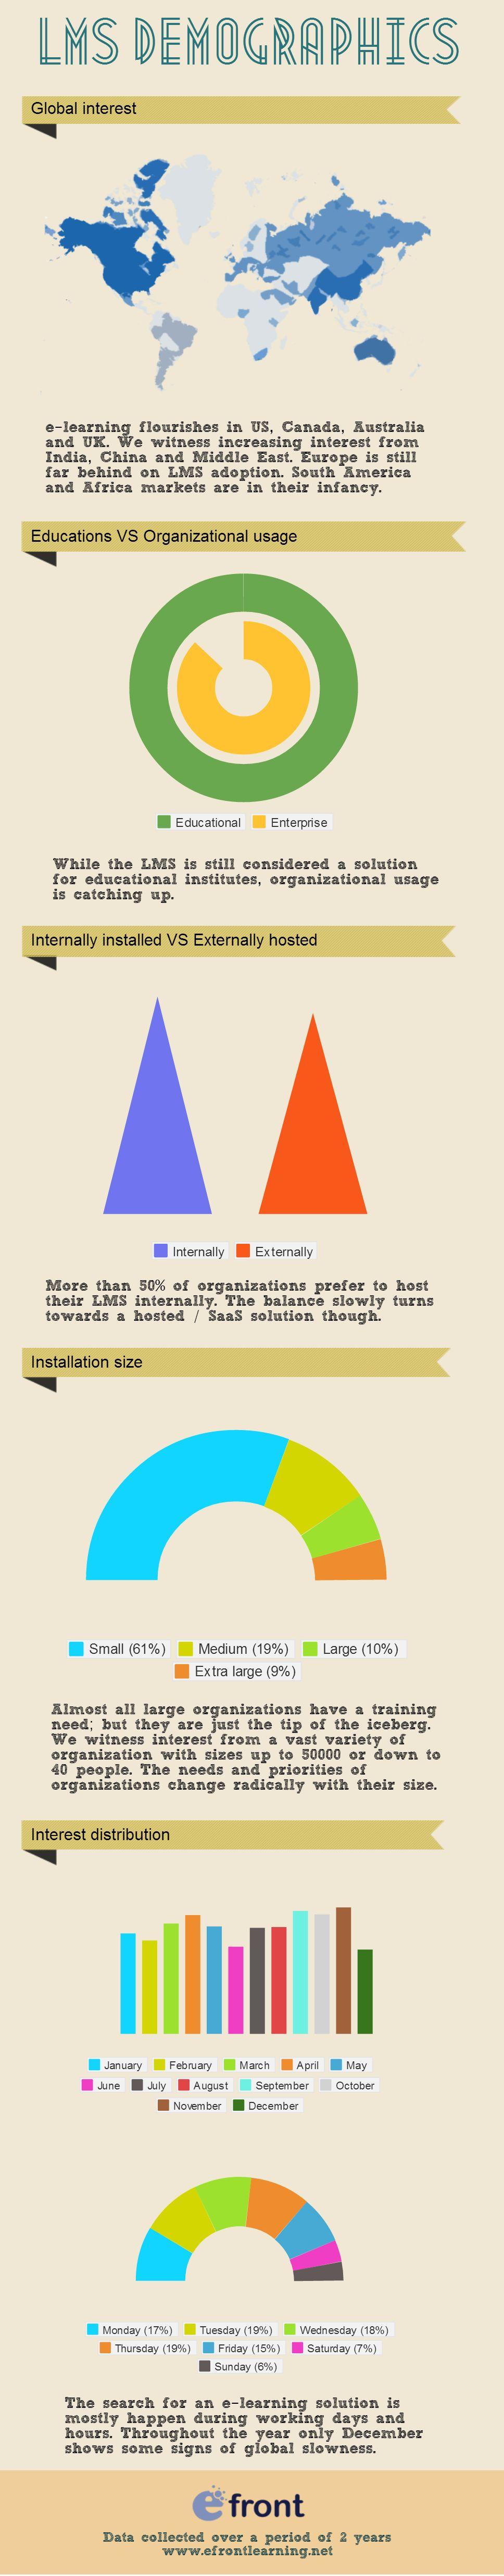 LMS Demographics